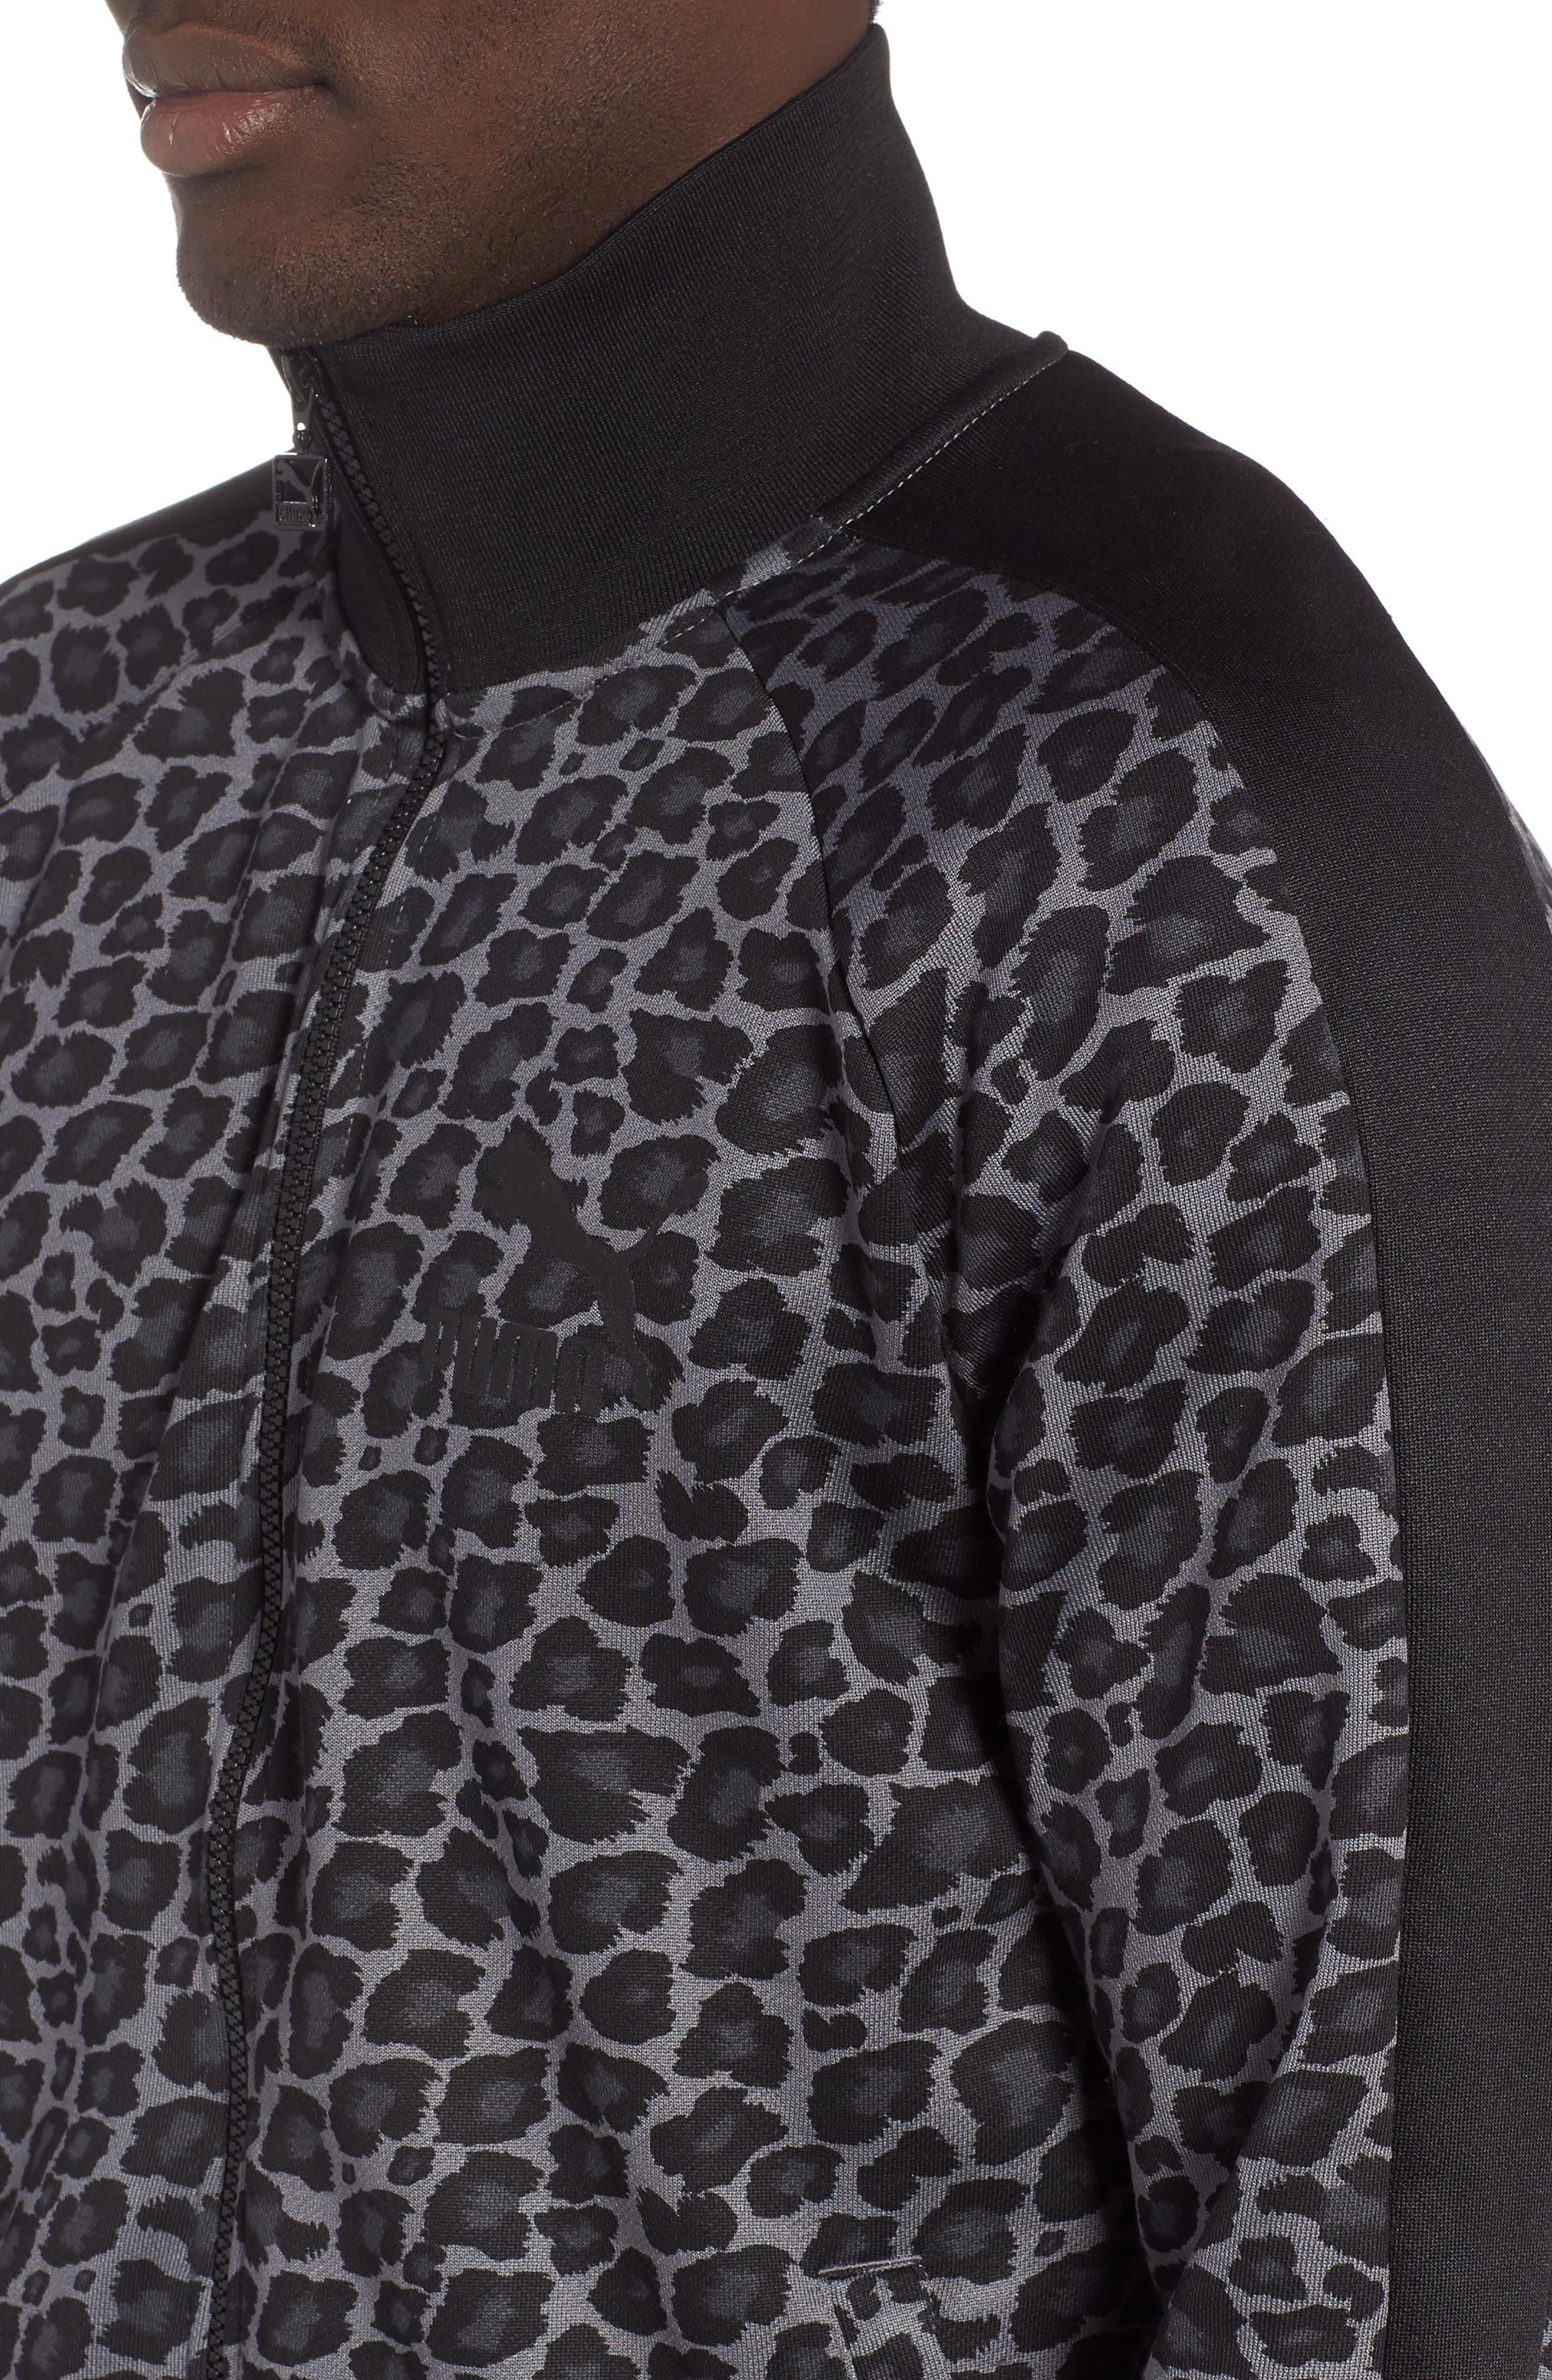 PUMA,                             Wild Pack T7 AOP Zip Track Jacket,                             Alternate thumbnail 4, color,                             060